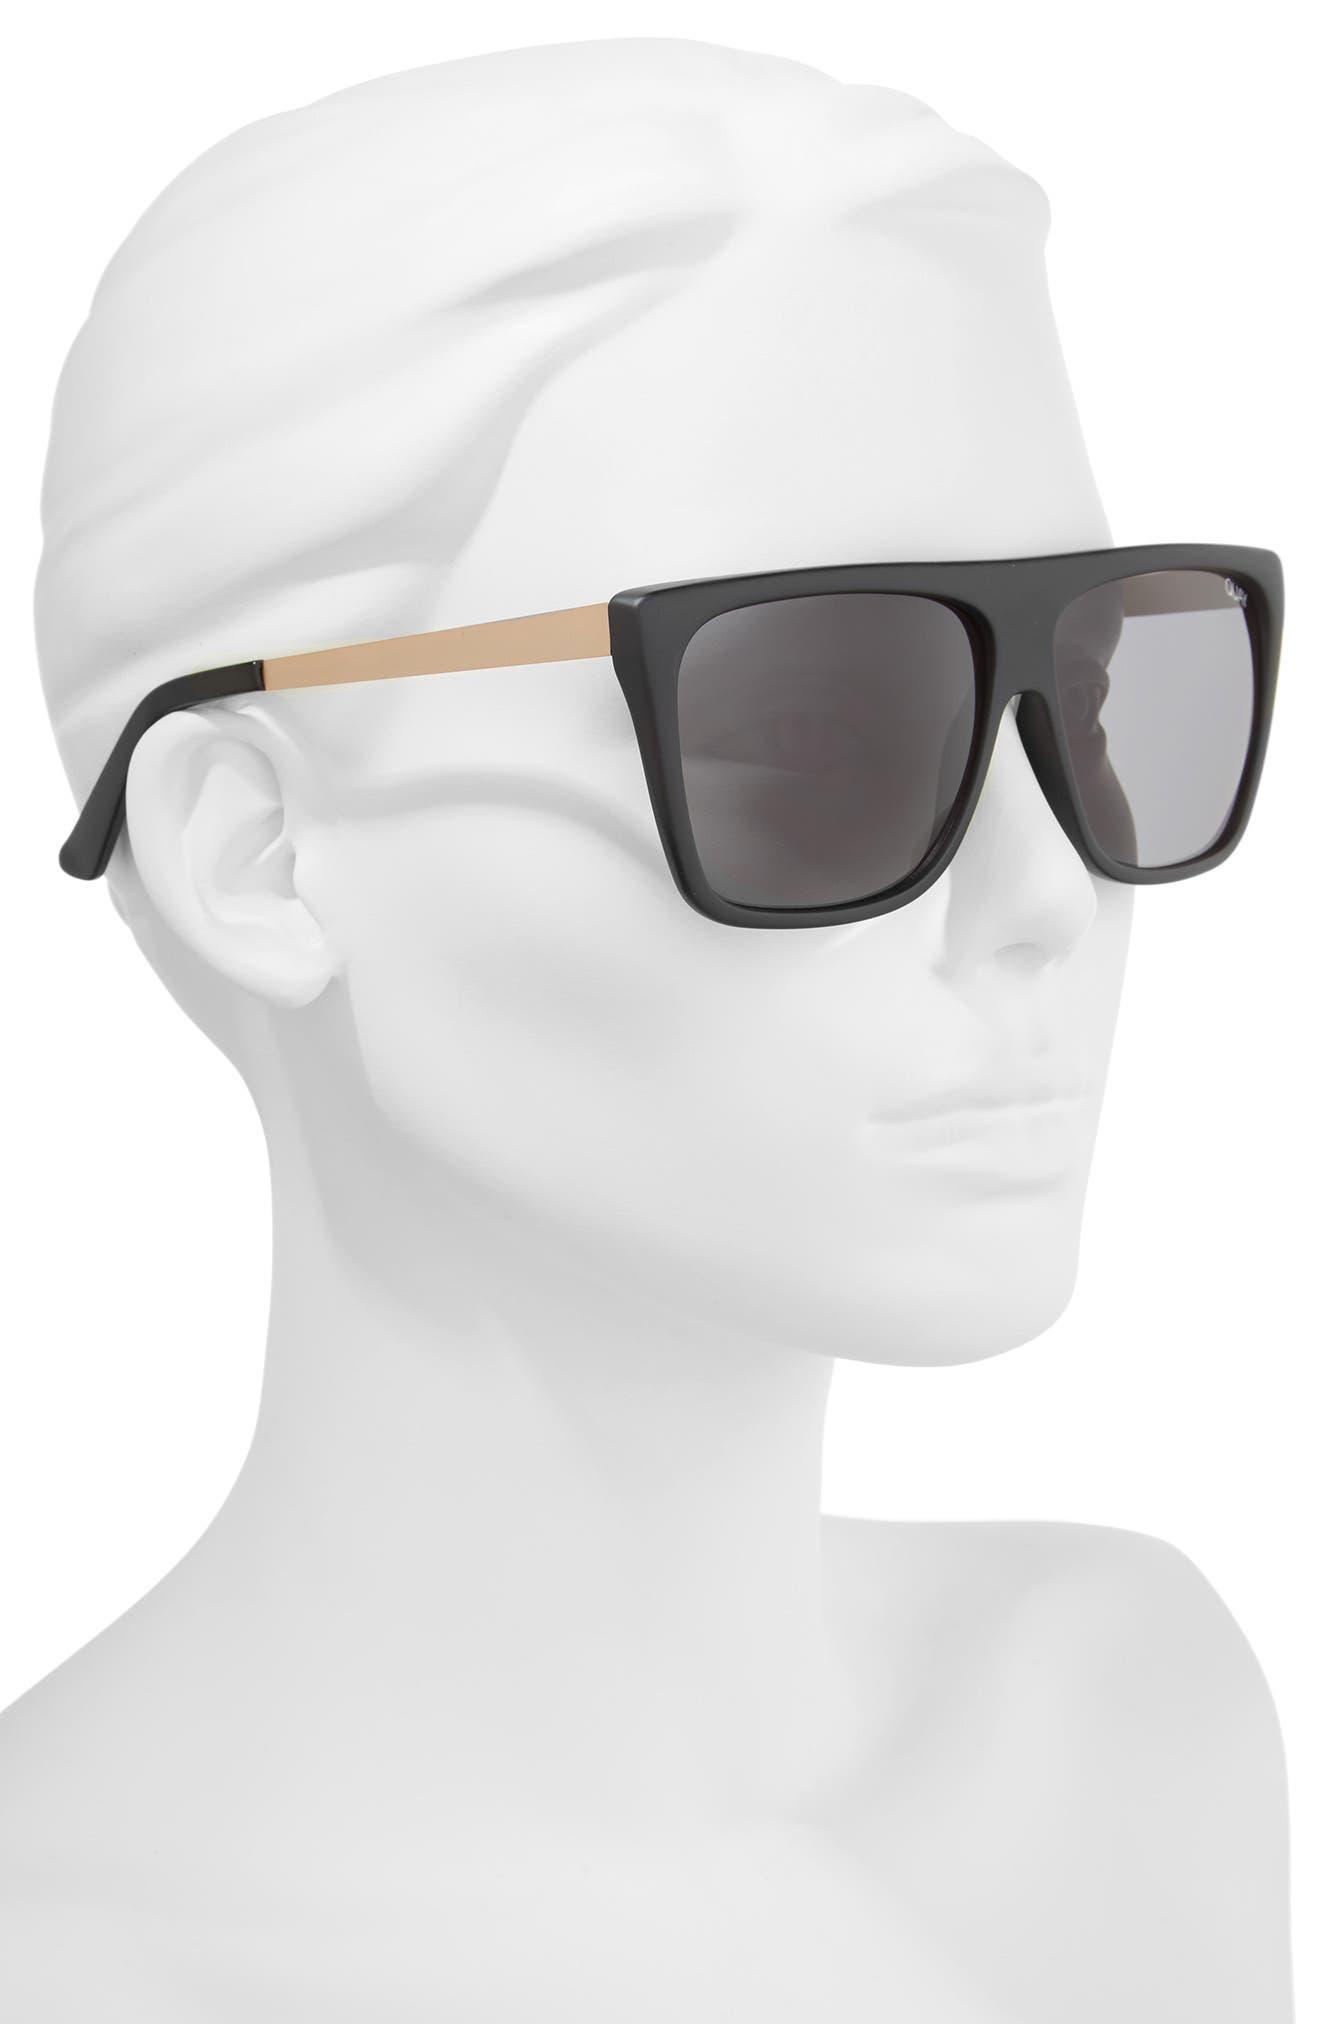 QUAY AUSTRALIA, x Desi Perkins On the Low 60mm Square Sunglasses, Alternate thumbnail 2, color, BLACK/ SMOKE